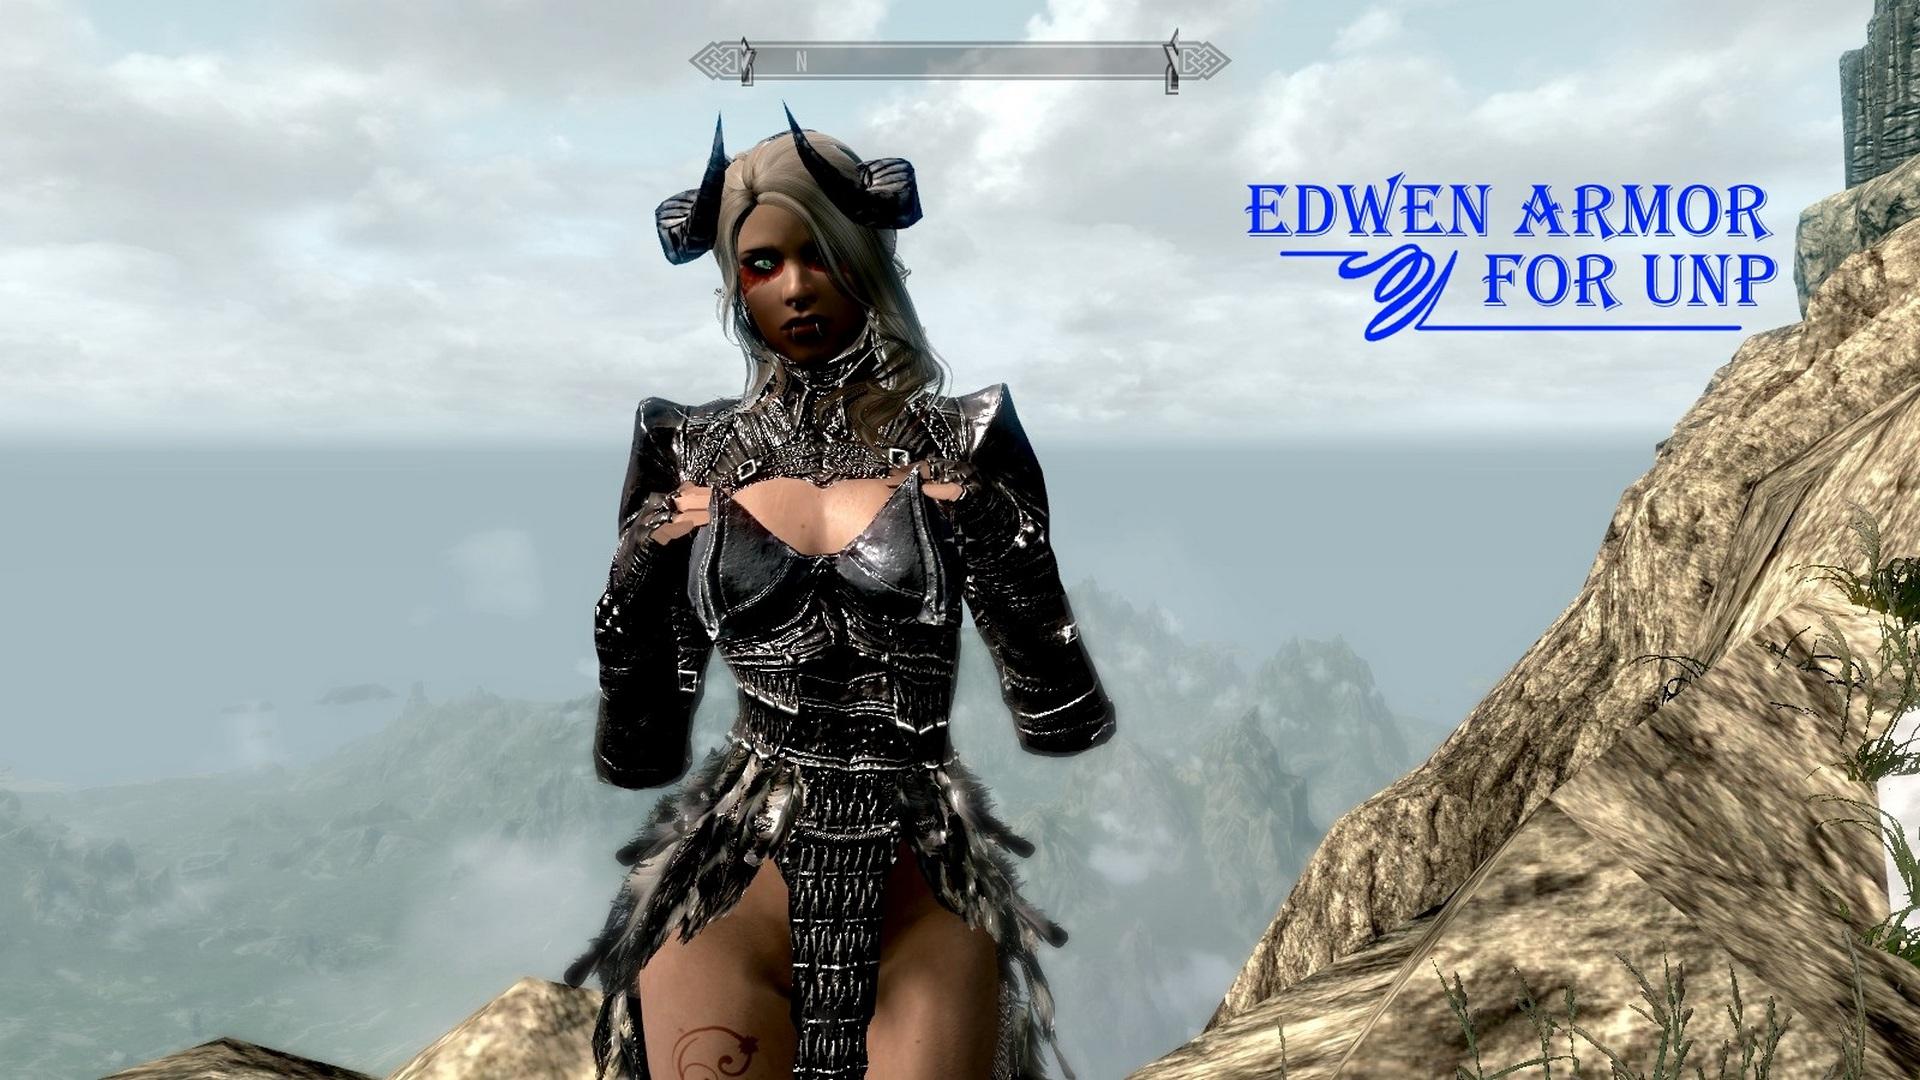 Edwen_armor_for_unp.jpg